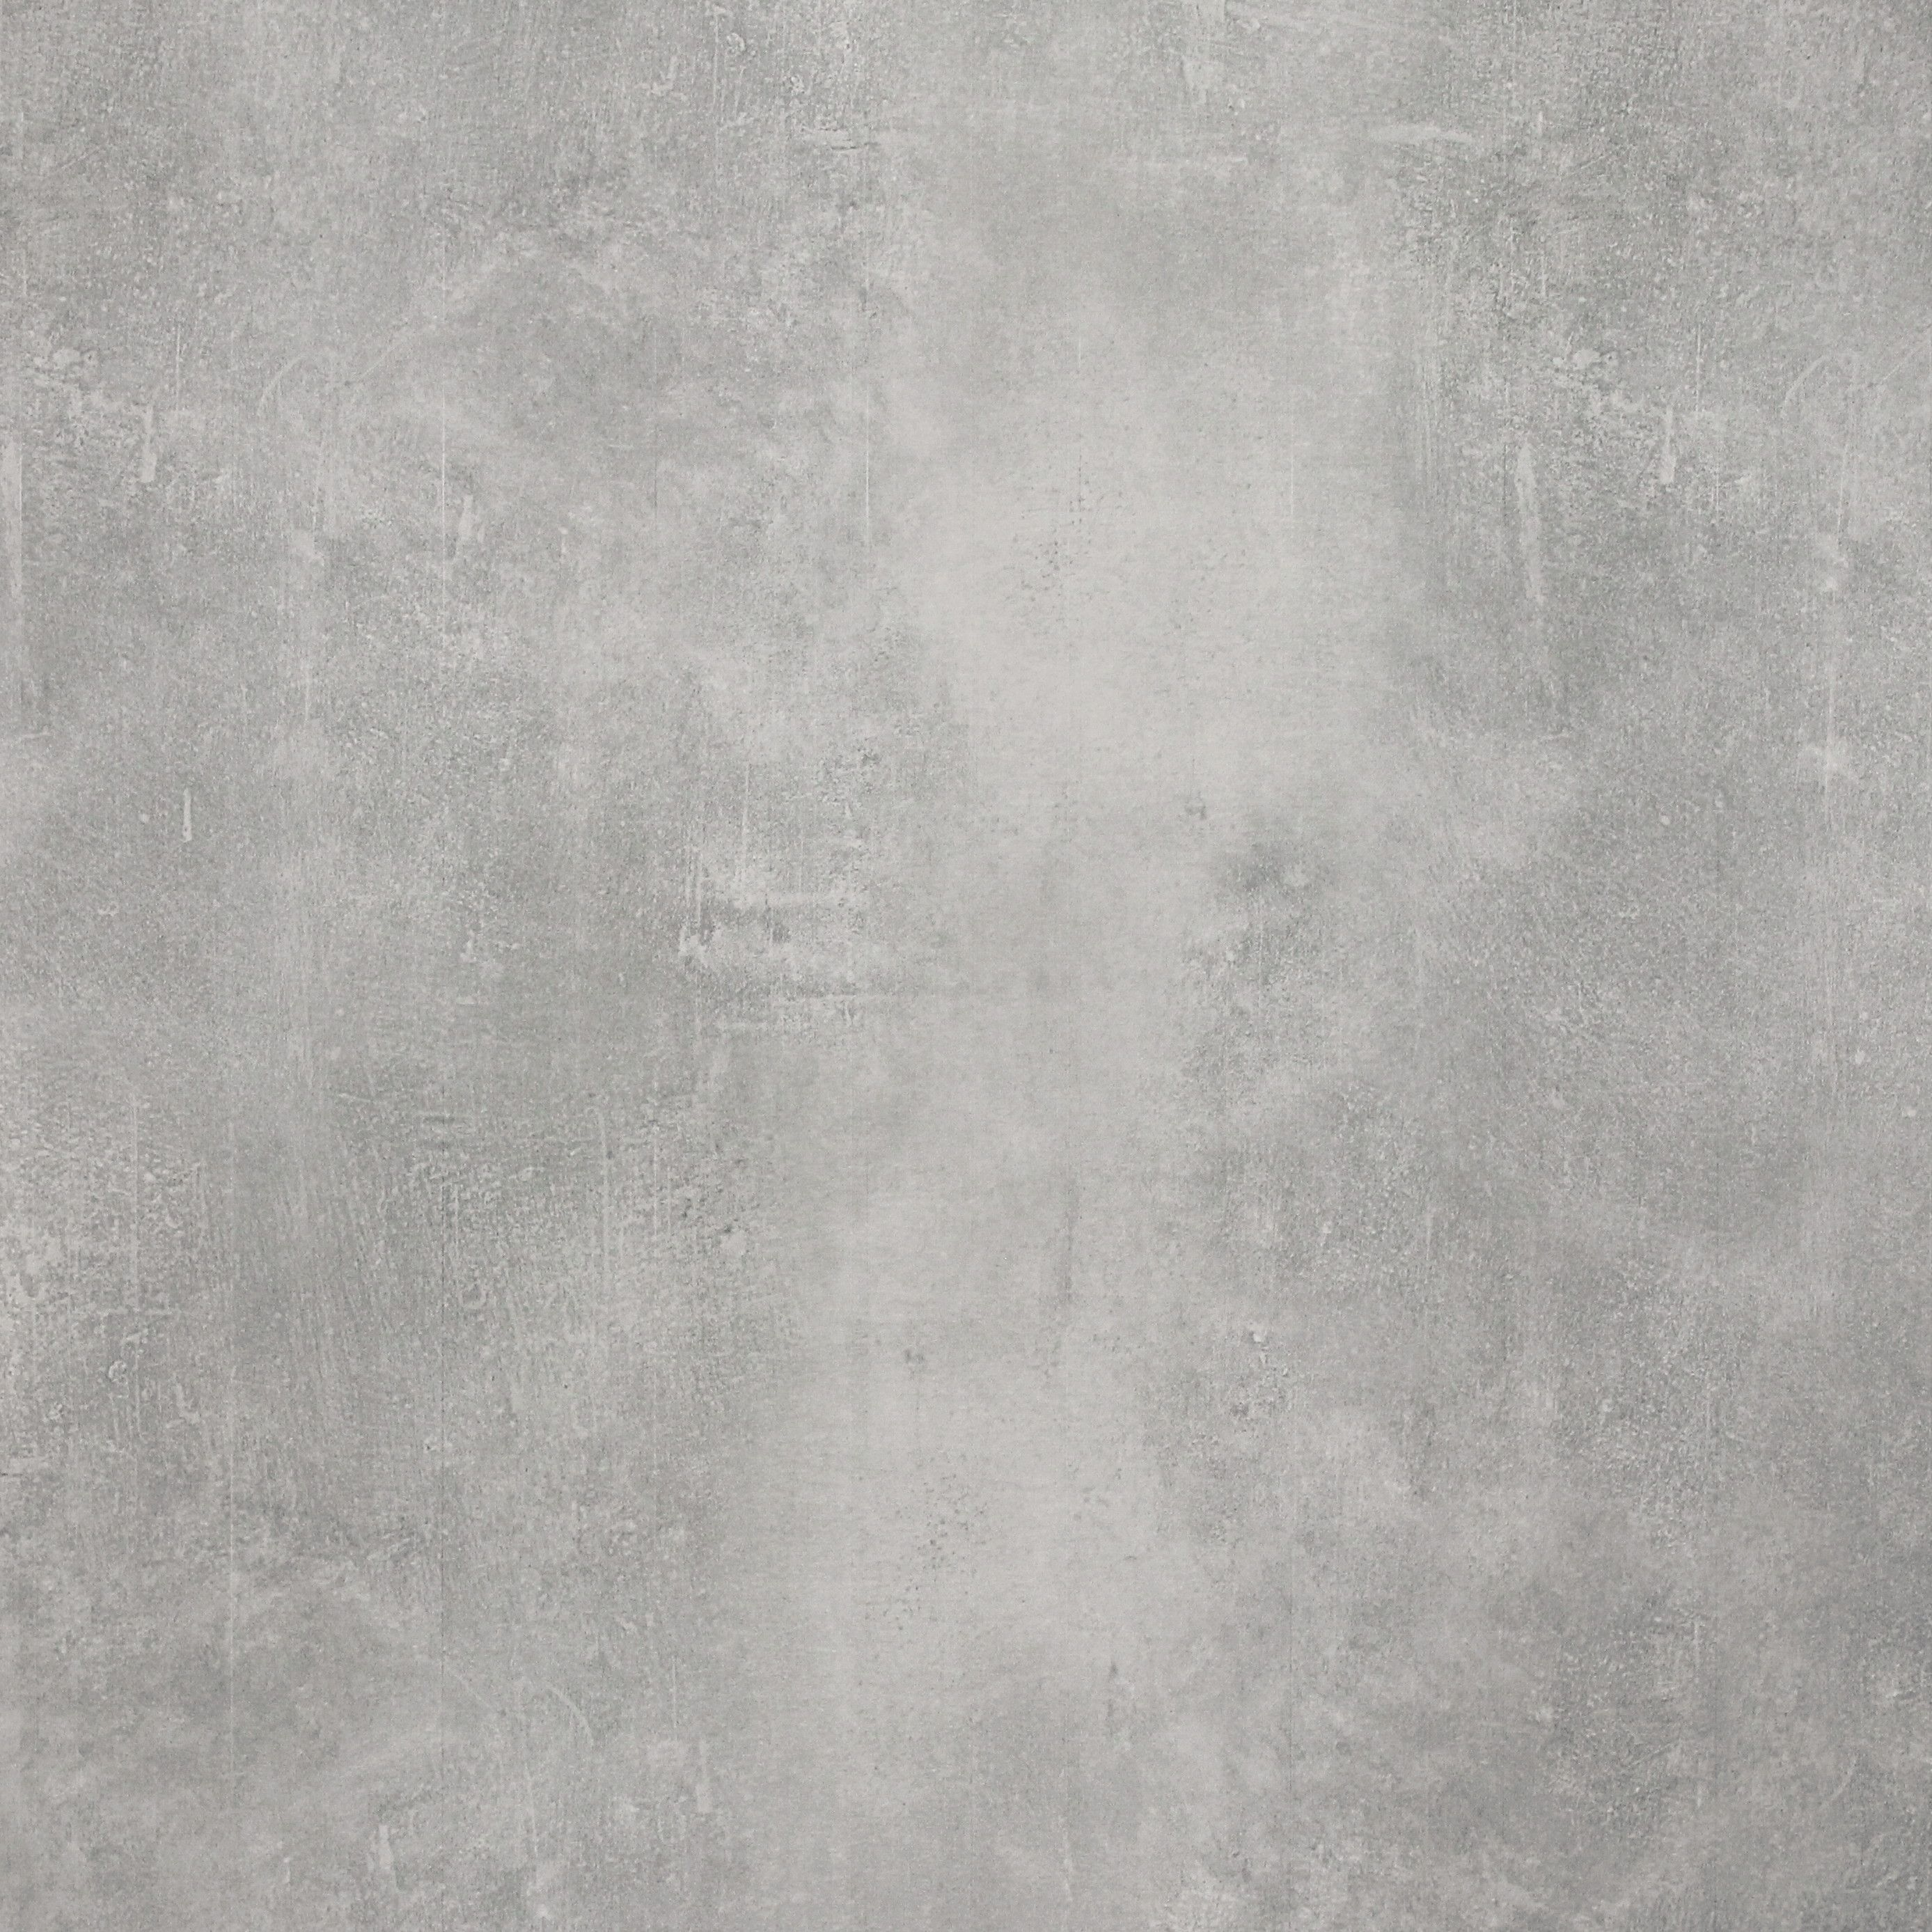 fkeu beton grau bodenfliese 60x60 cm r9 art nr fkeu0990369 in 2018 wohnen pinterest. Black Bedroom Furniture Sets. Home Design Ideas